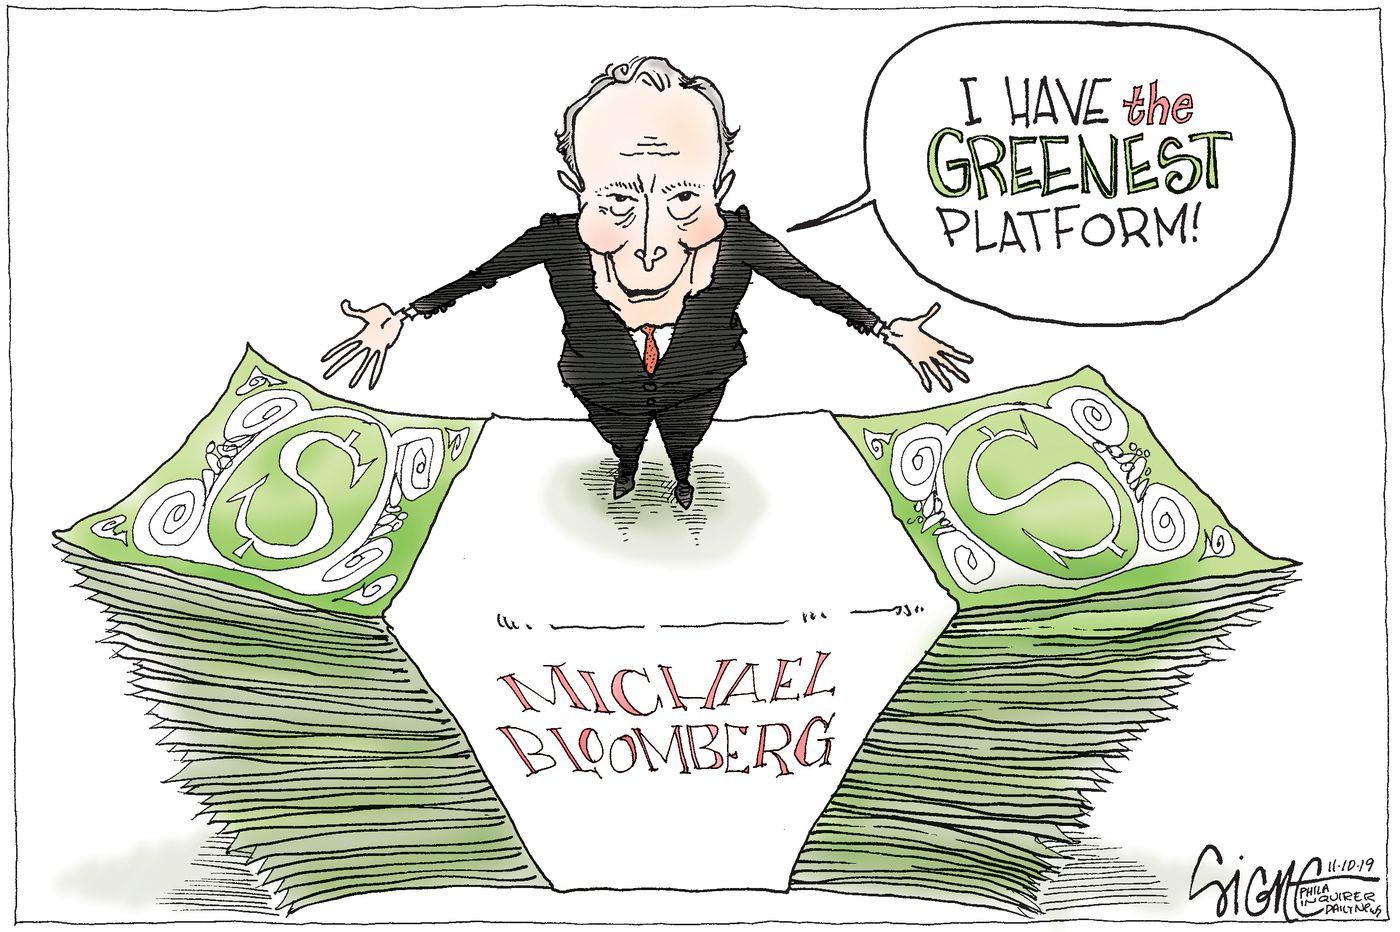 Political Cartoon: Michael Bloomberg's green credentials